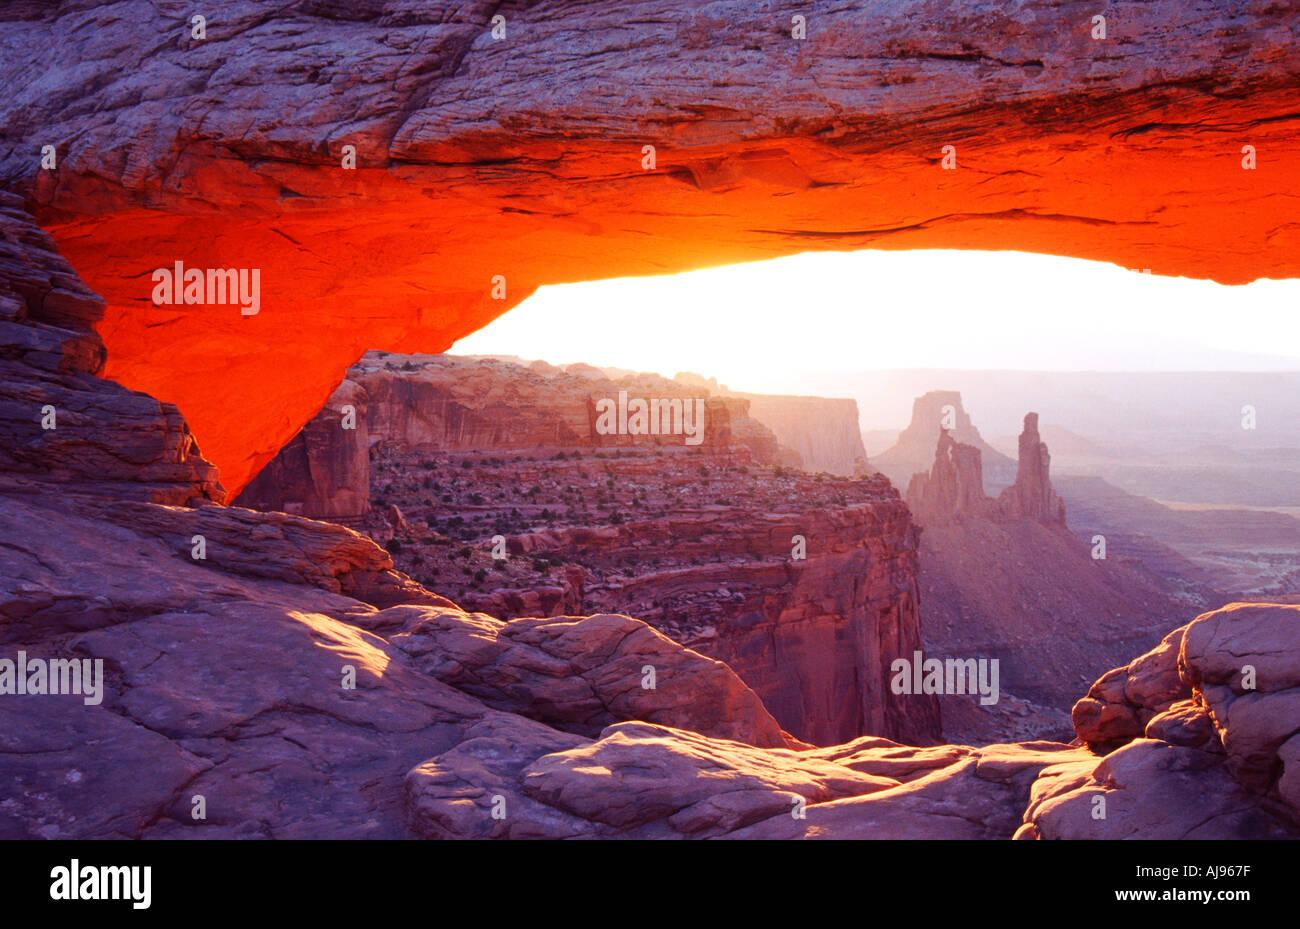 Dawn sun lights the underside of Mesa Arch, Canyonlands National Park, Utah, USA - Stock Image